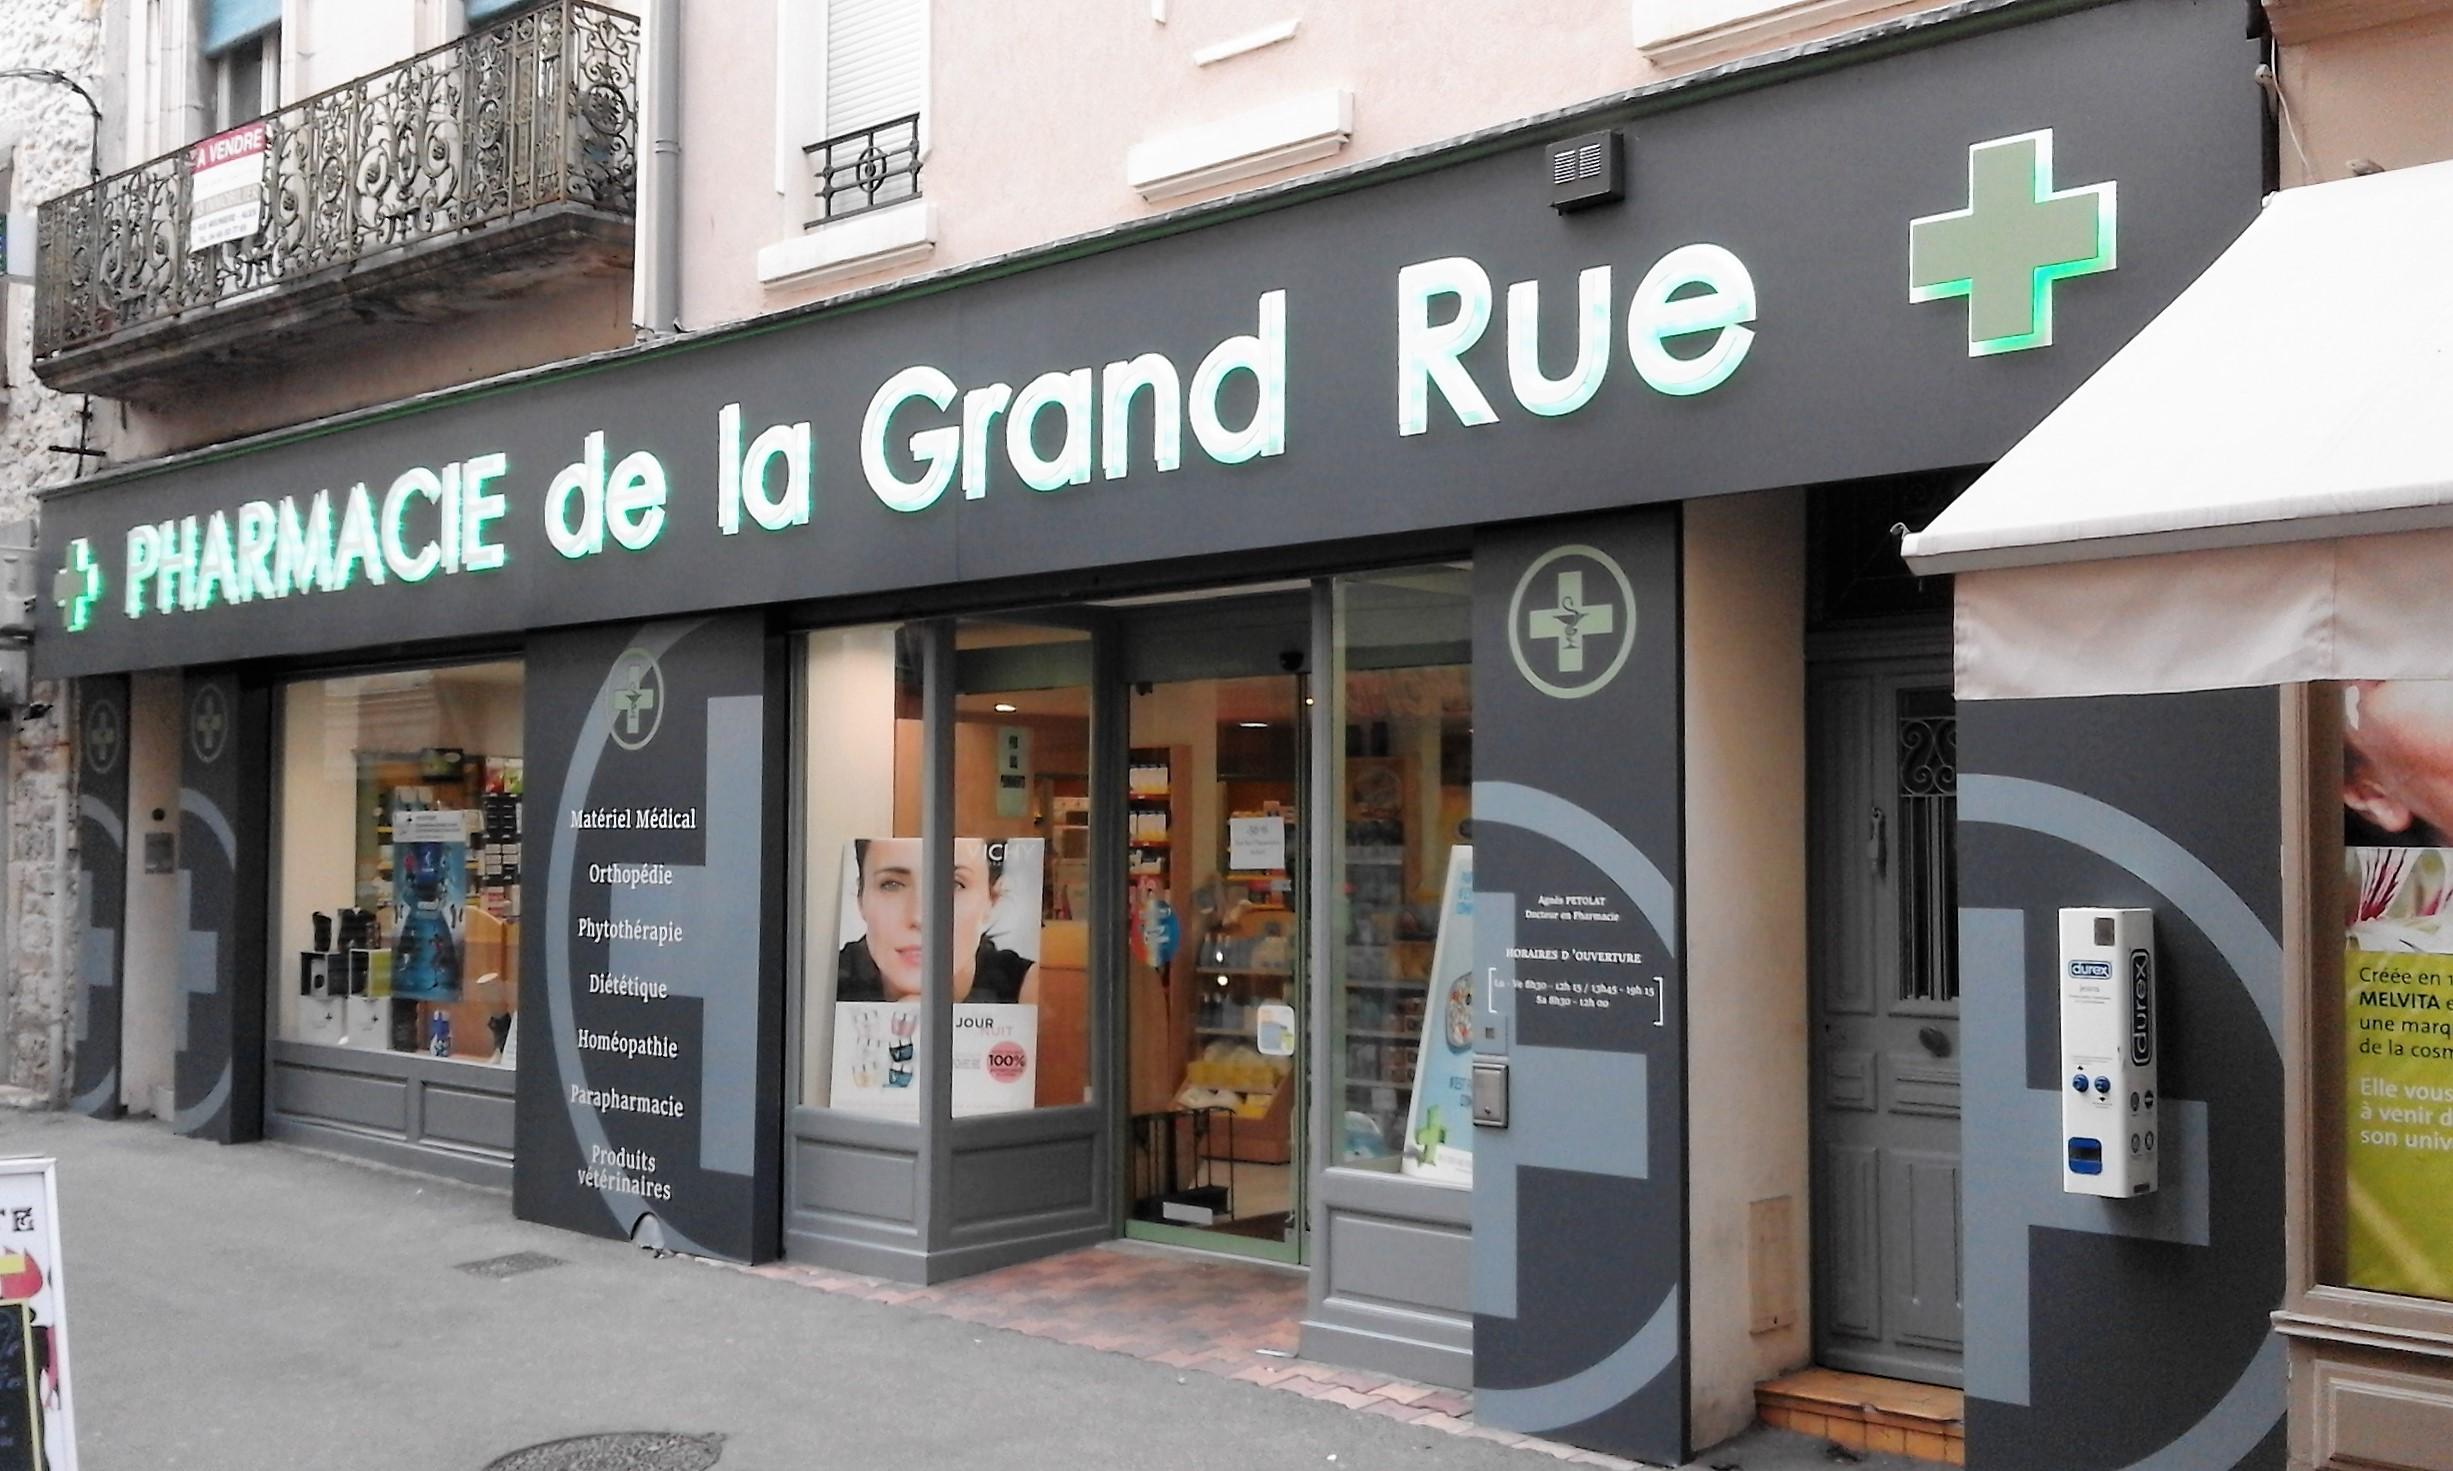 Pharmacie_de_la_Grand_Rue,_Alès